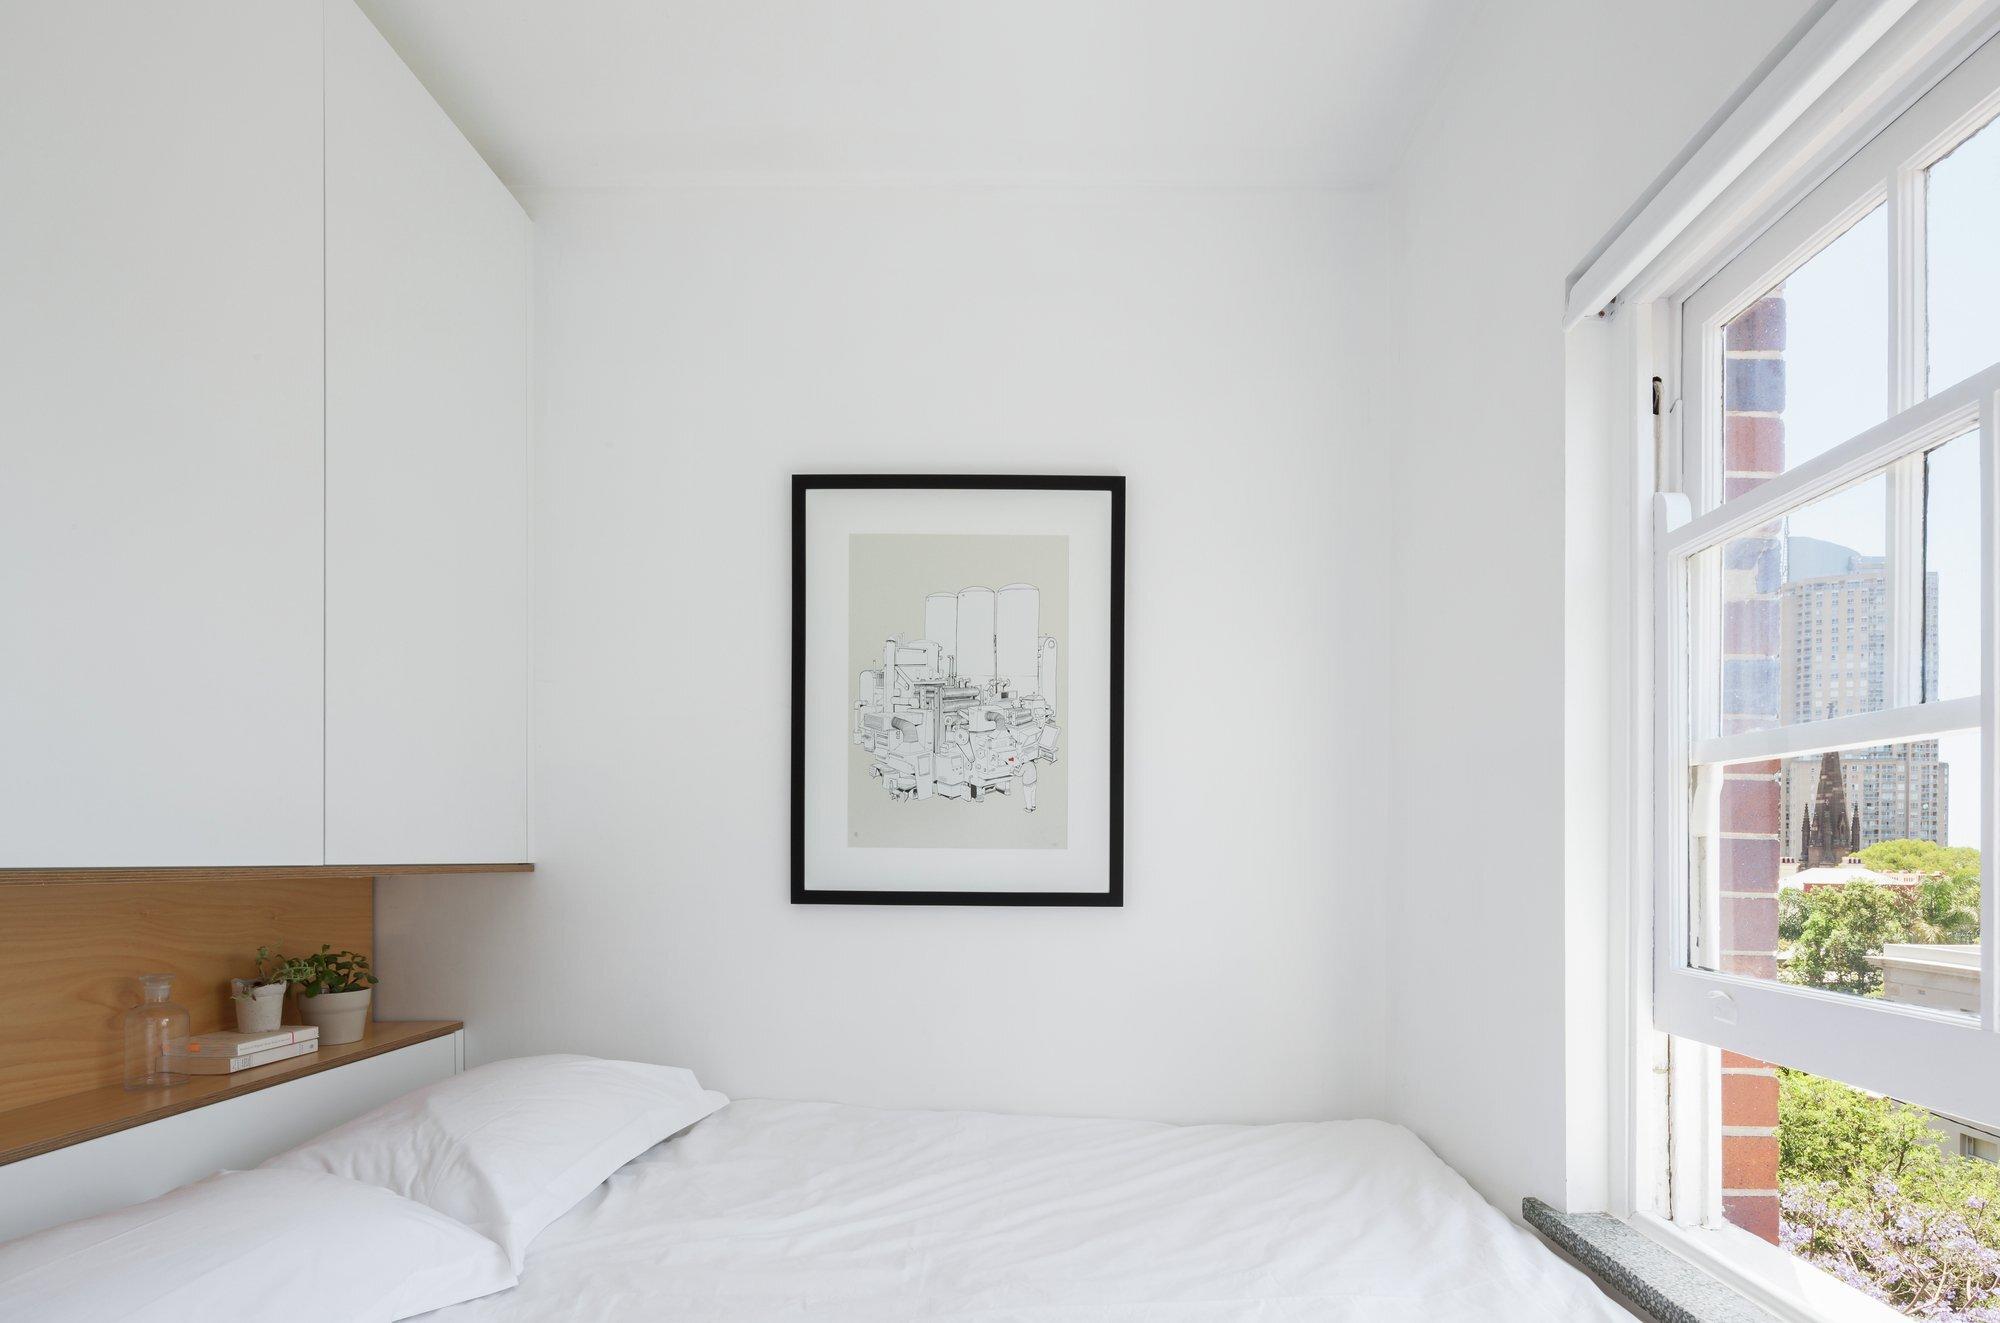 Darlinghurst Apartment - Tiny Apartment - Brad Swartz Architect - Australia - Bedroom - Humble Homes